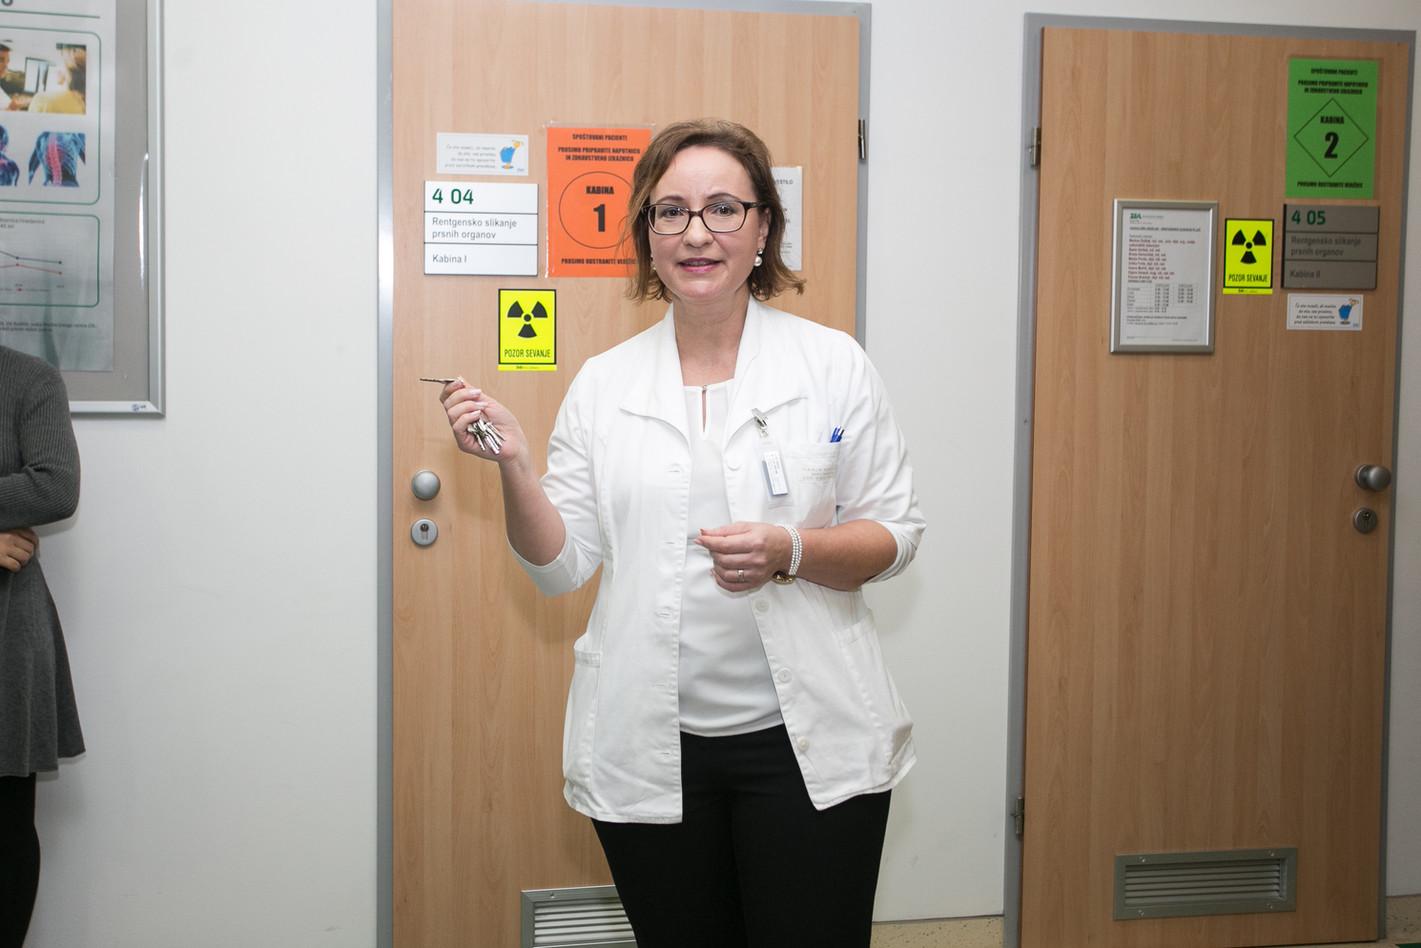 Vanja Kos, Head of Radiology Department of the Unit Center